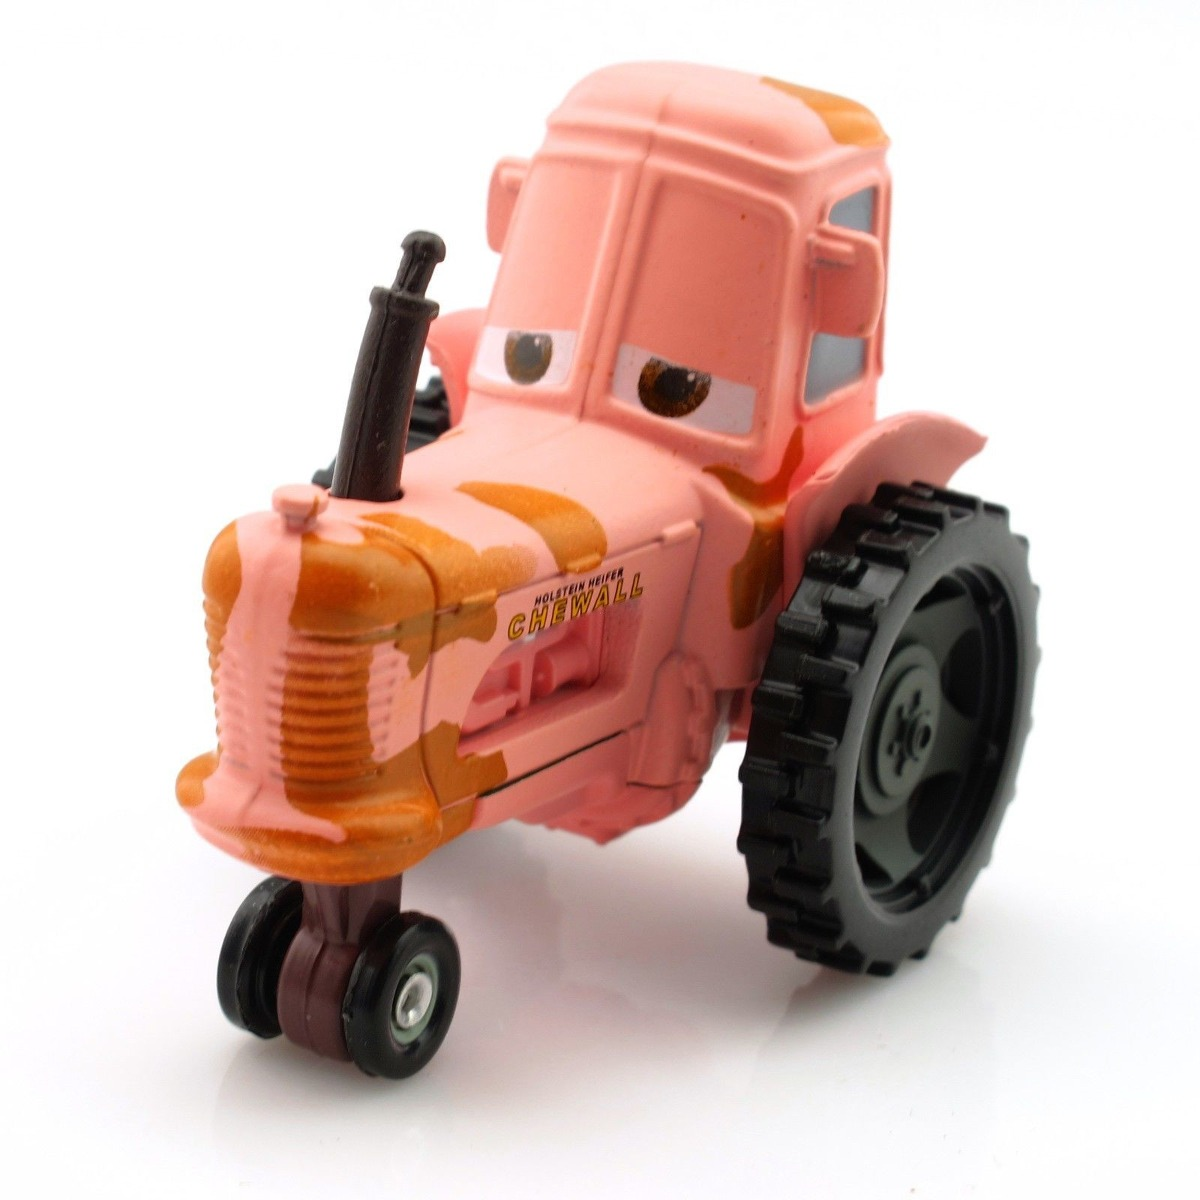 Tractor From Cars : Disney pixar cars tractor trator original da mattel